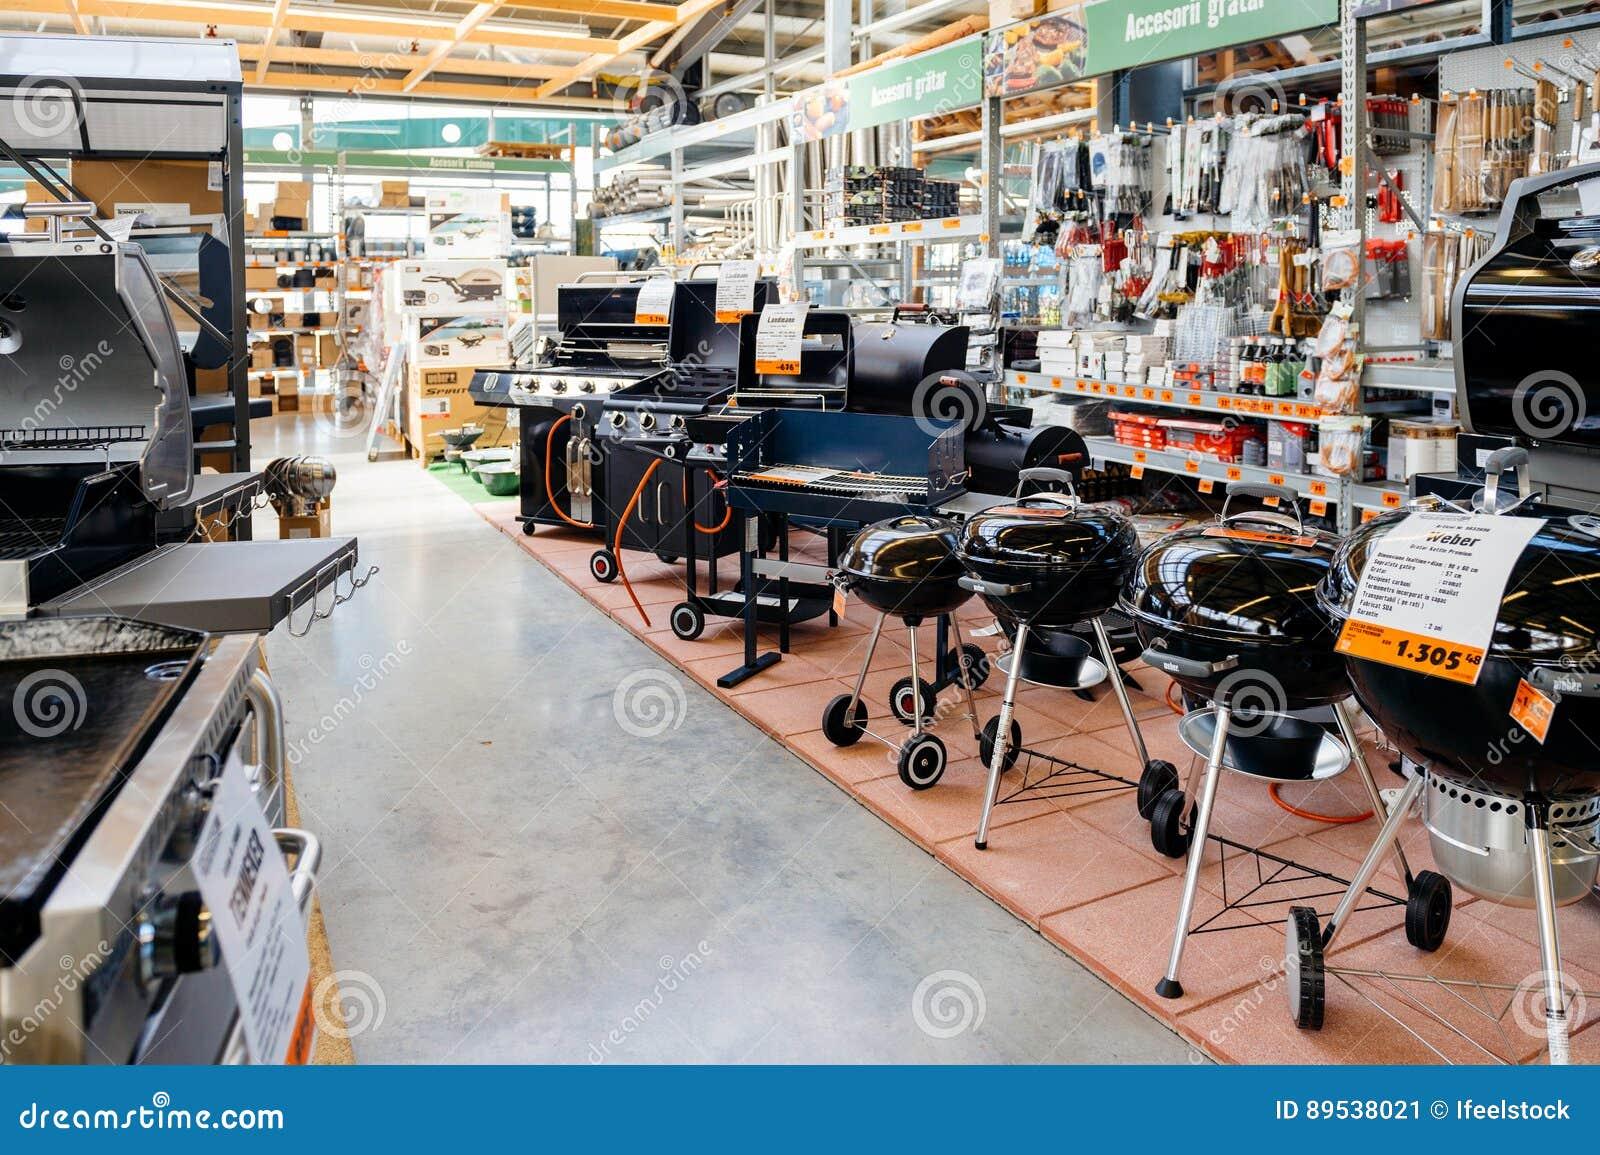 magasin de hornbach diy avec la grande s lection de barbecue des appareils photo ditorial. Black Bedroom Furniture Sets. Home Design Ideas